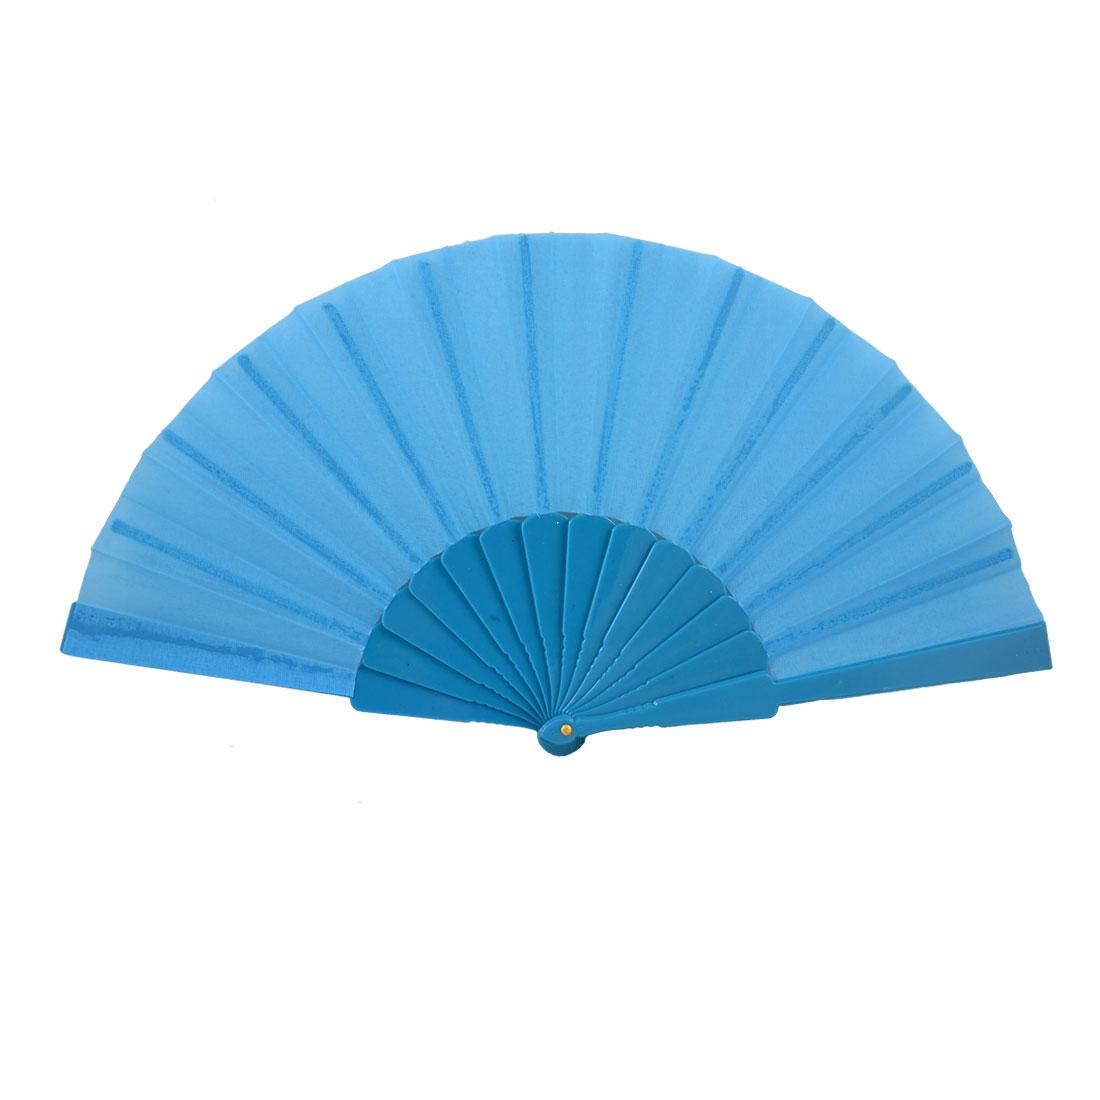 "Plastic Frame 16.5"" Width Fabric Foldable Hand Fan Gift Cyan Blue"